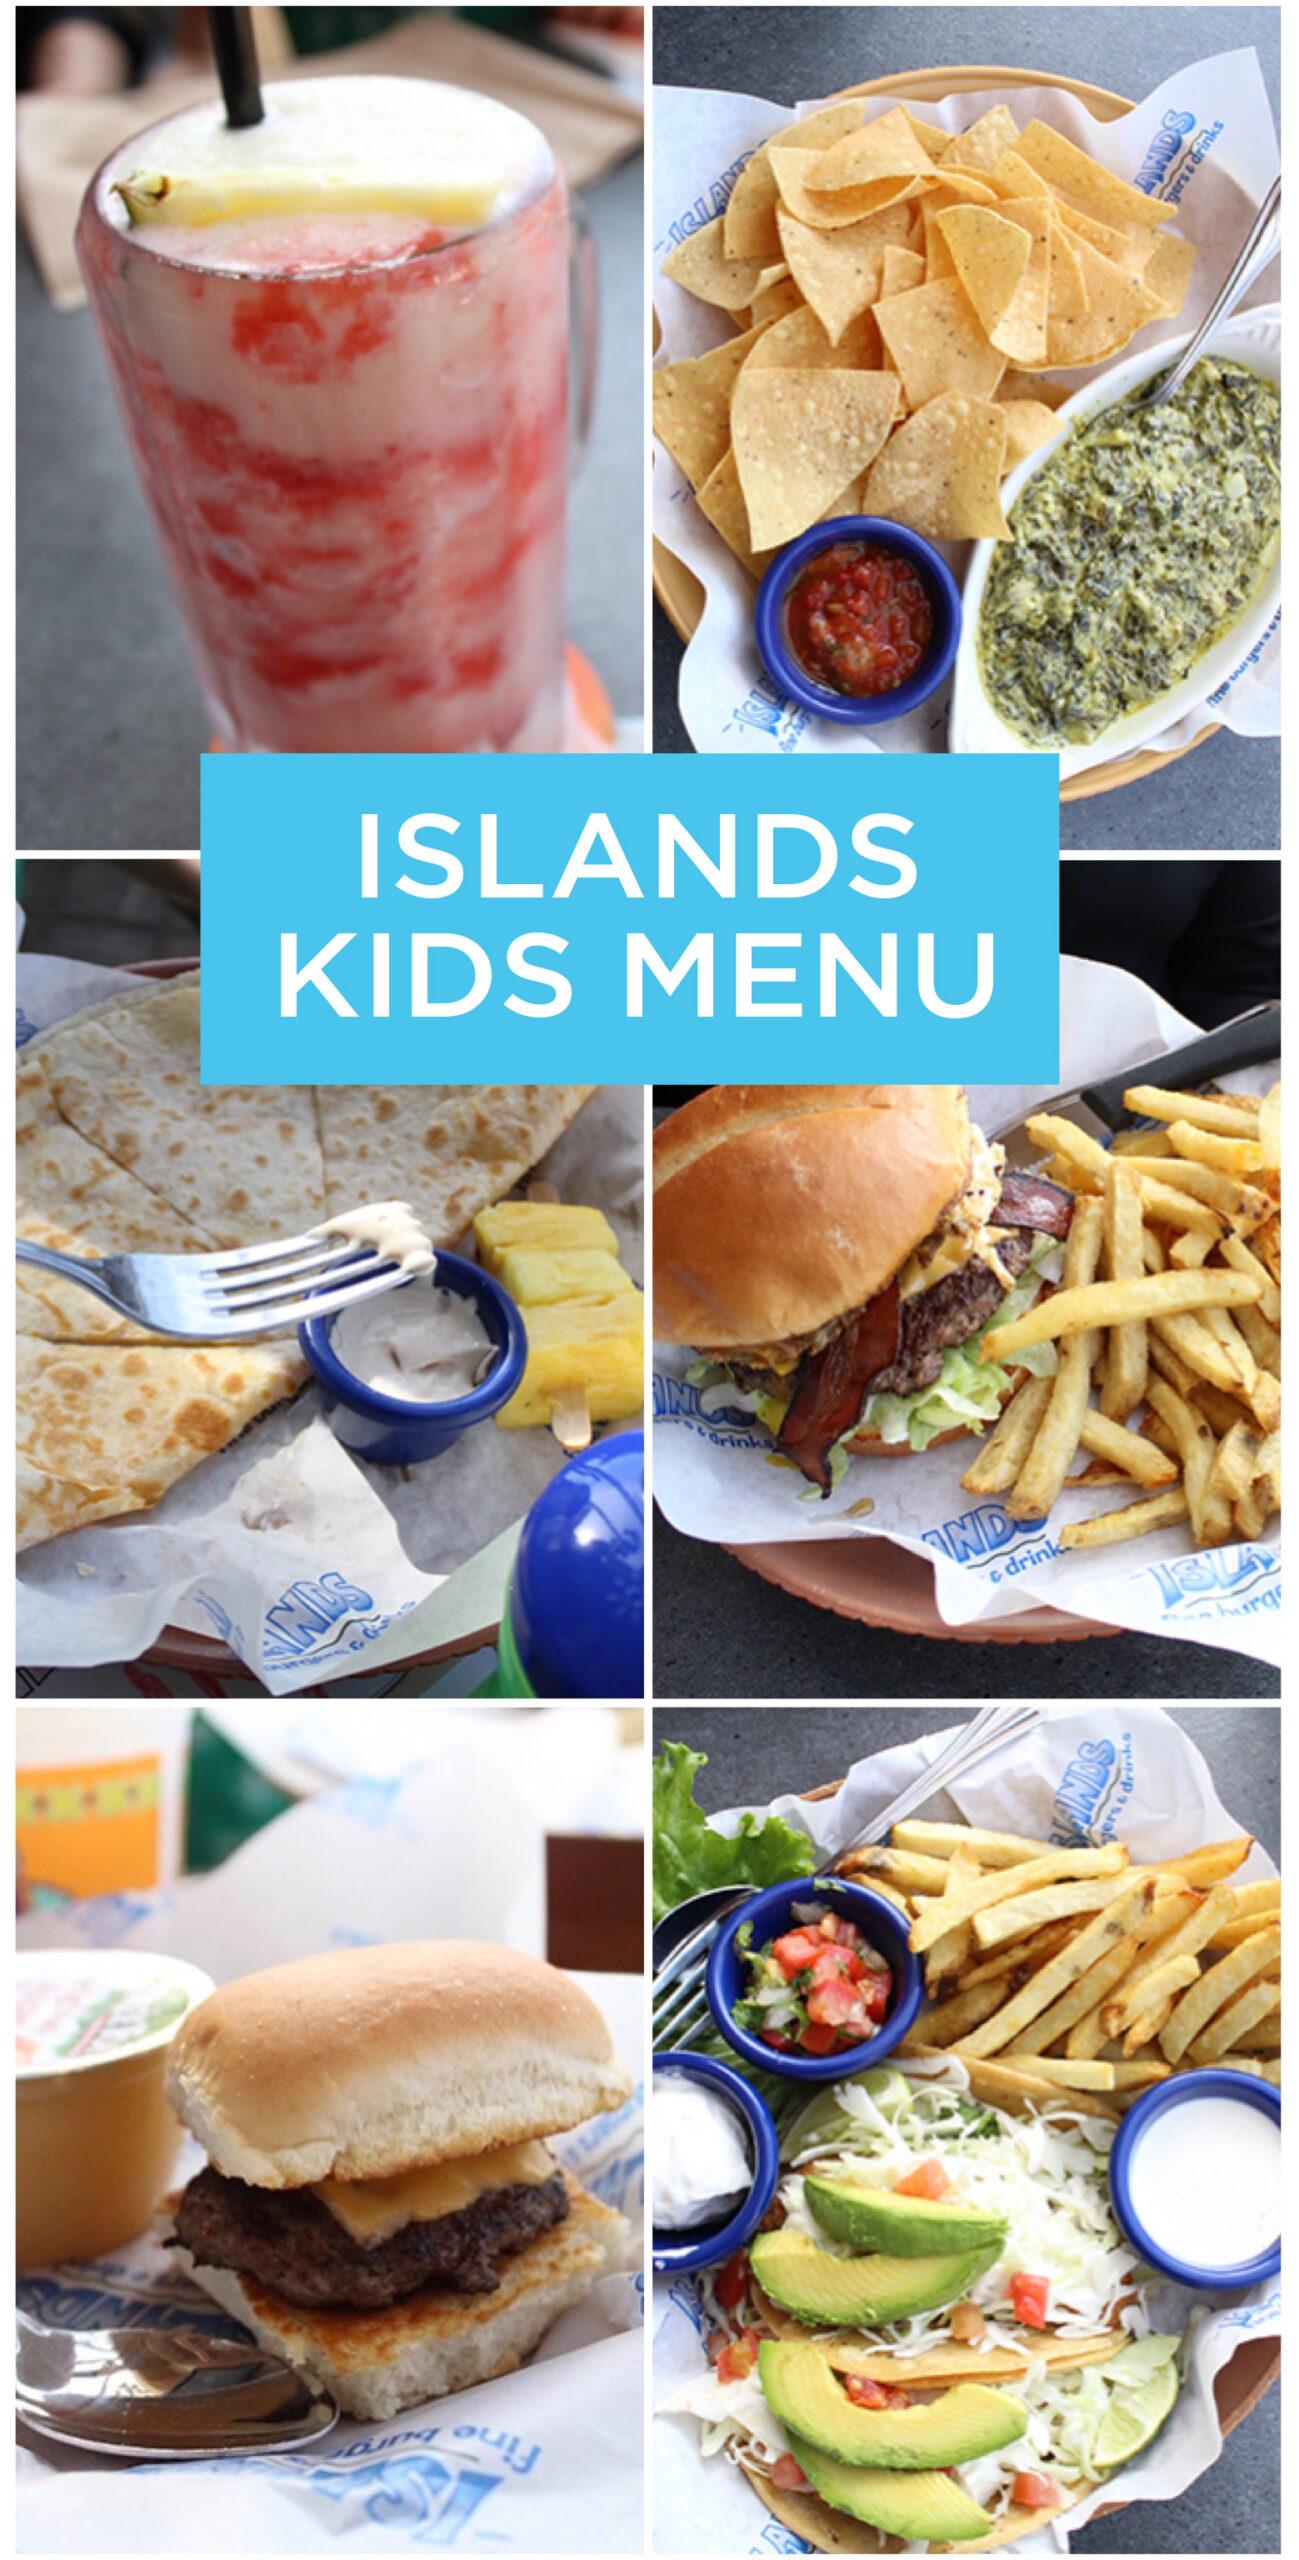 Islands Kids Menu